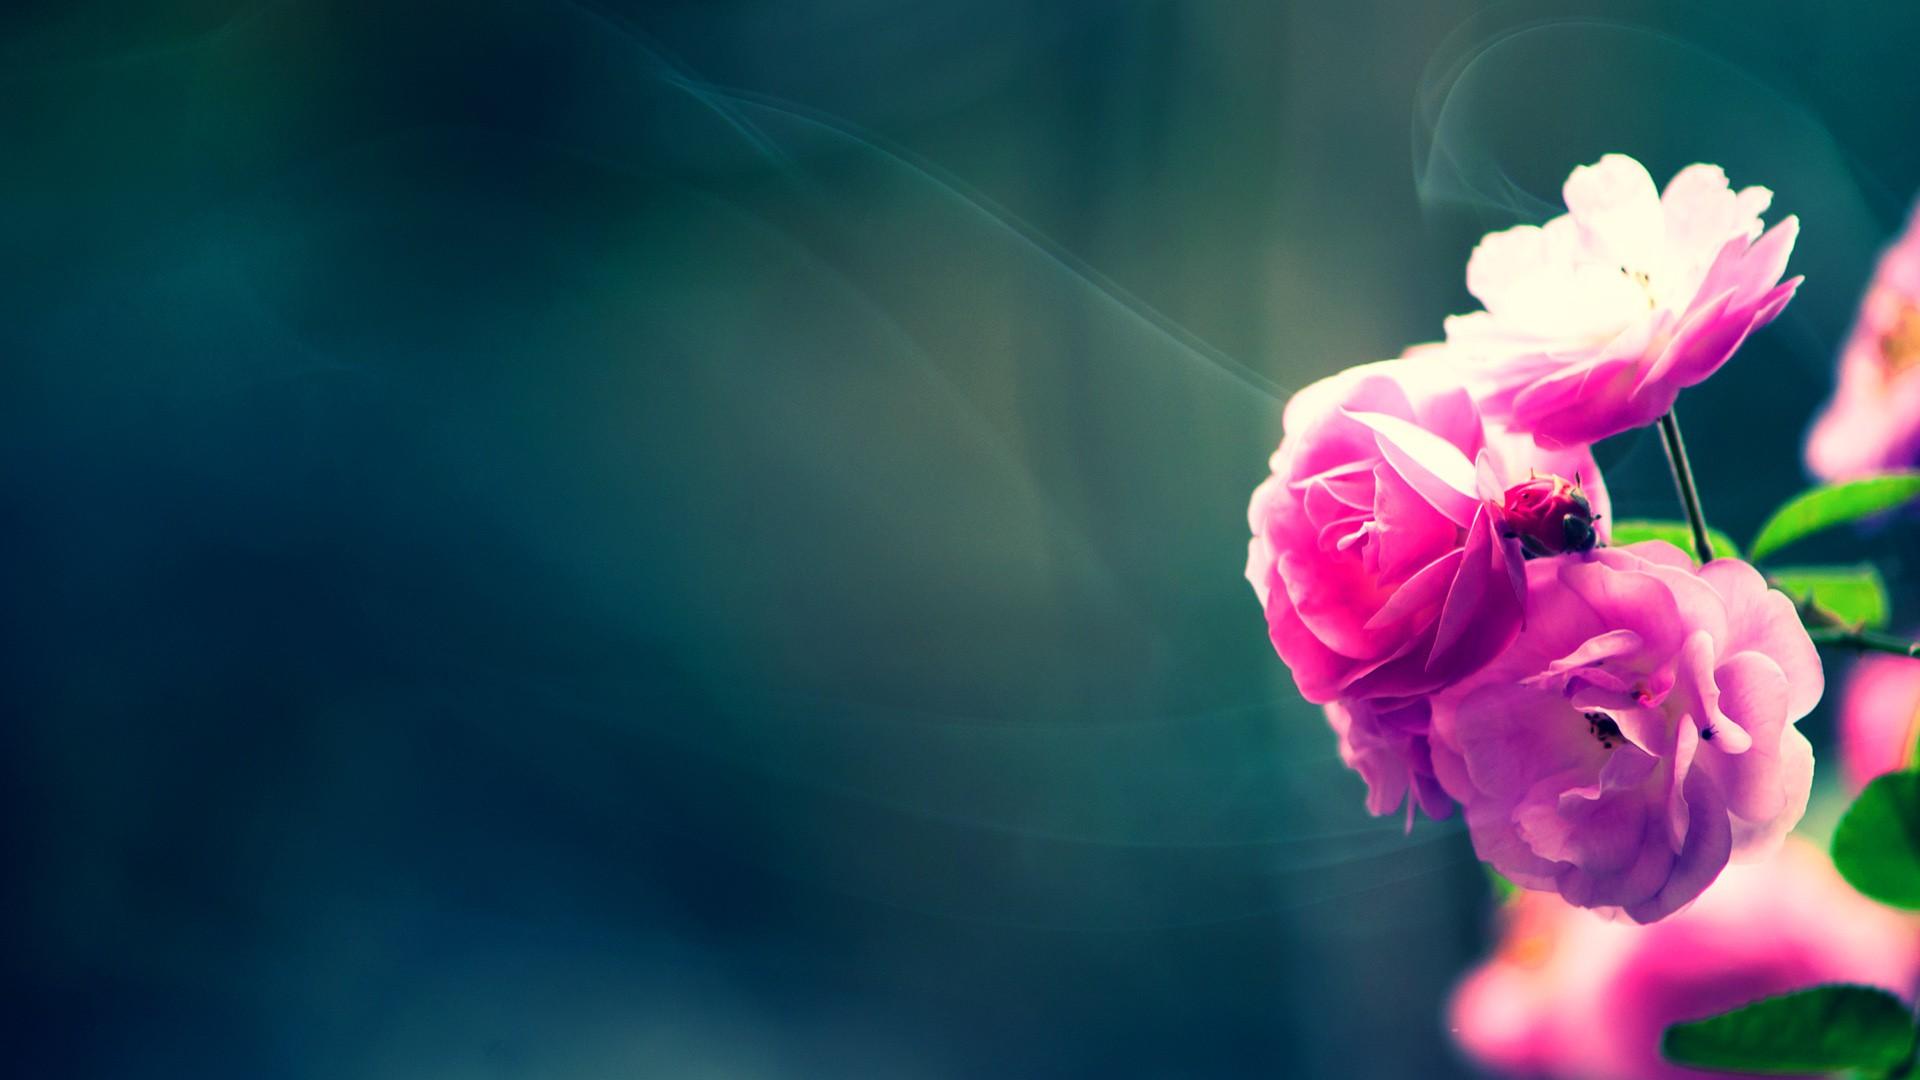 1000+ ideas about Hd Flower Wallpaper on Pinterest   Spring